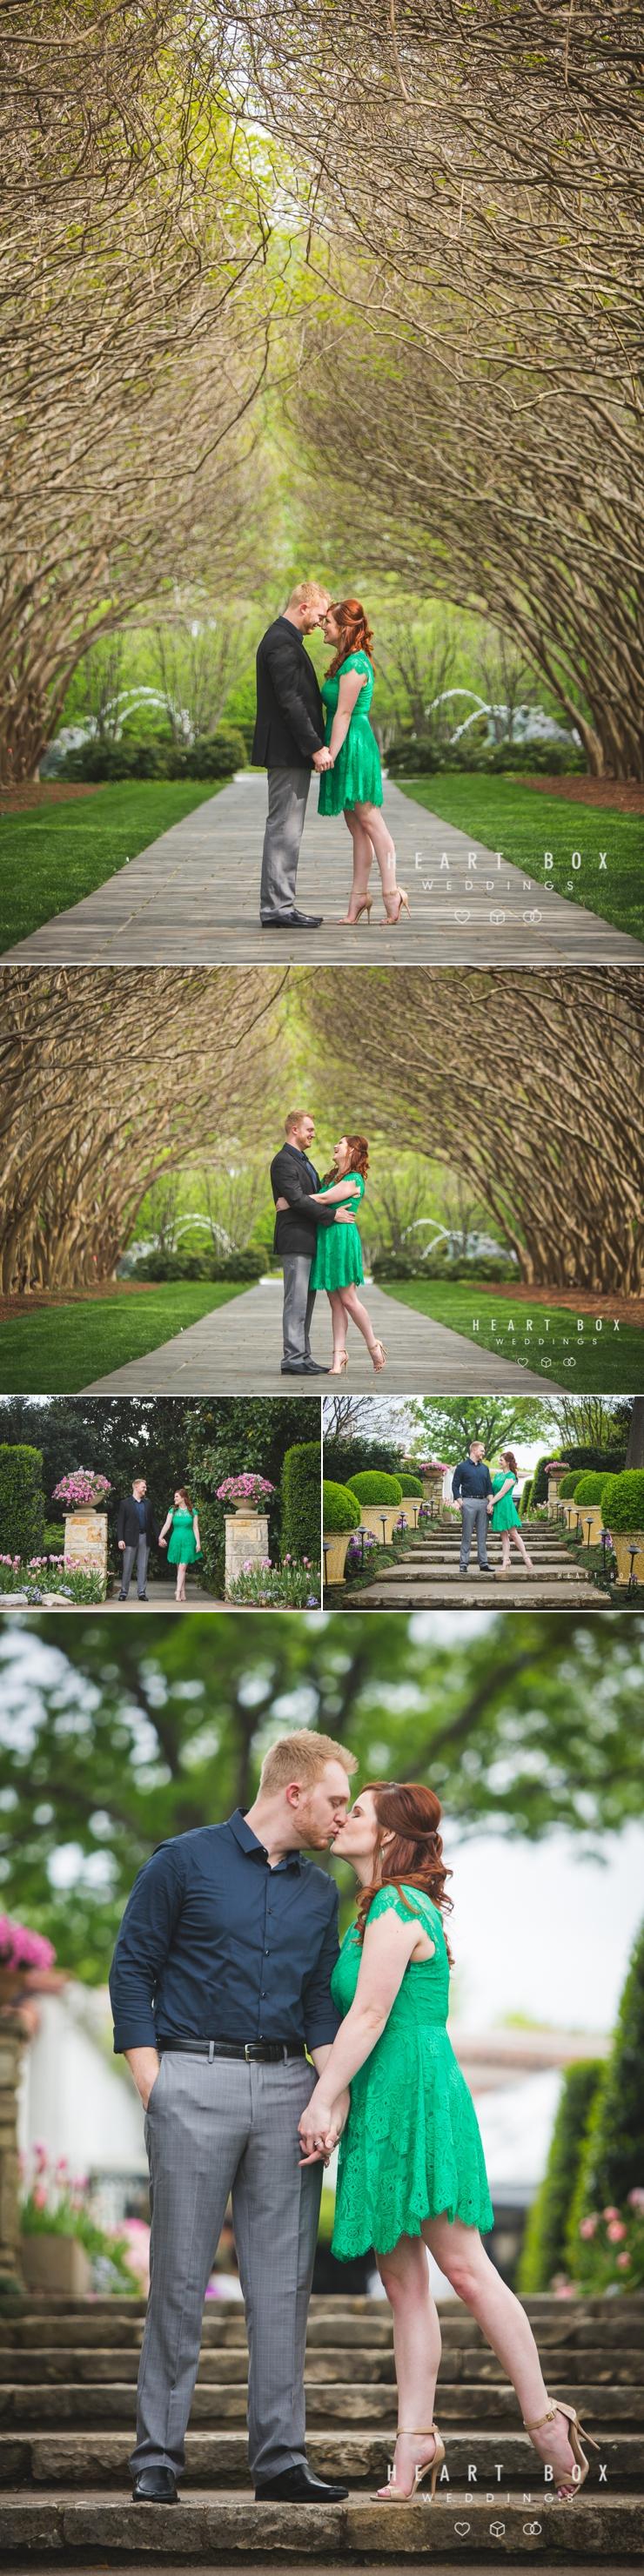 Murphey-Engagement-Blog-Collage-1.jpg